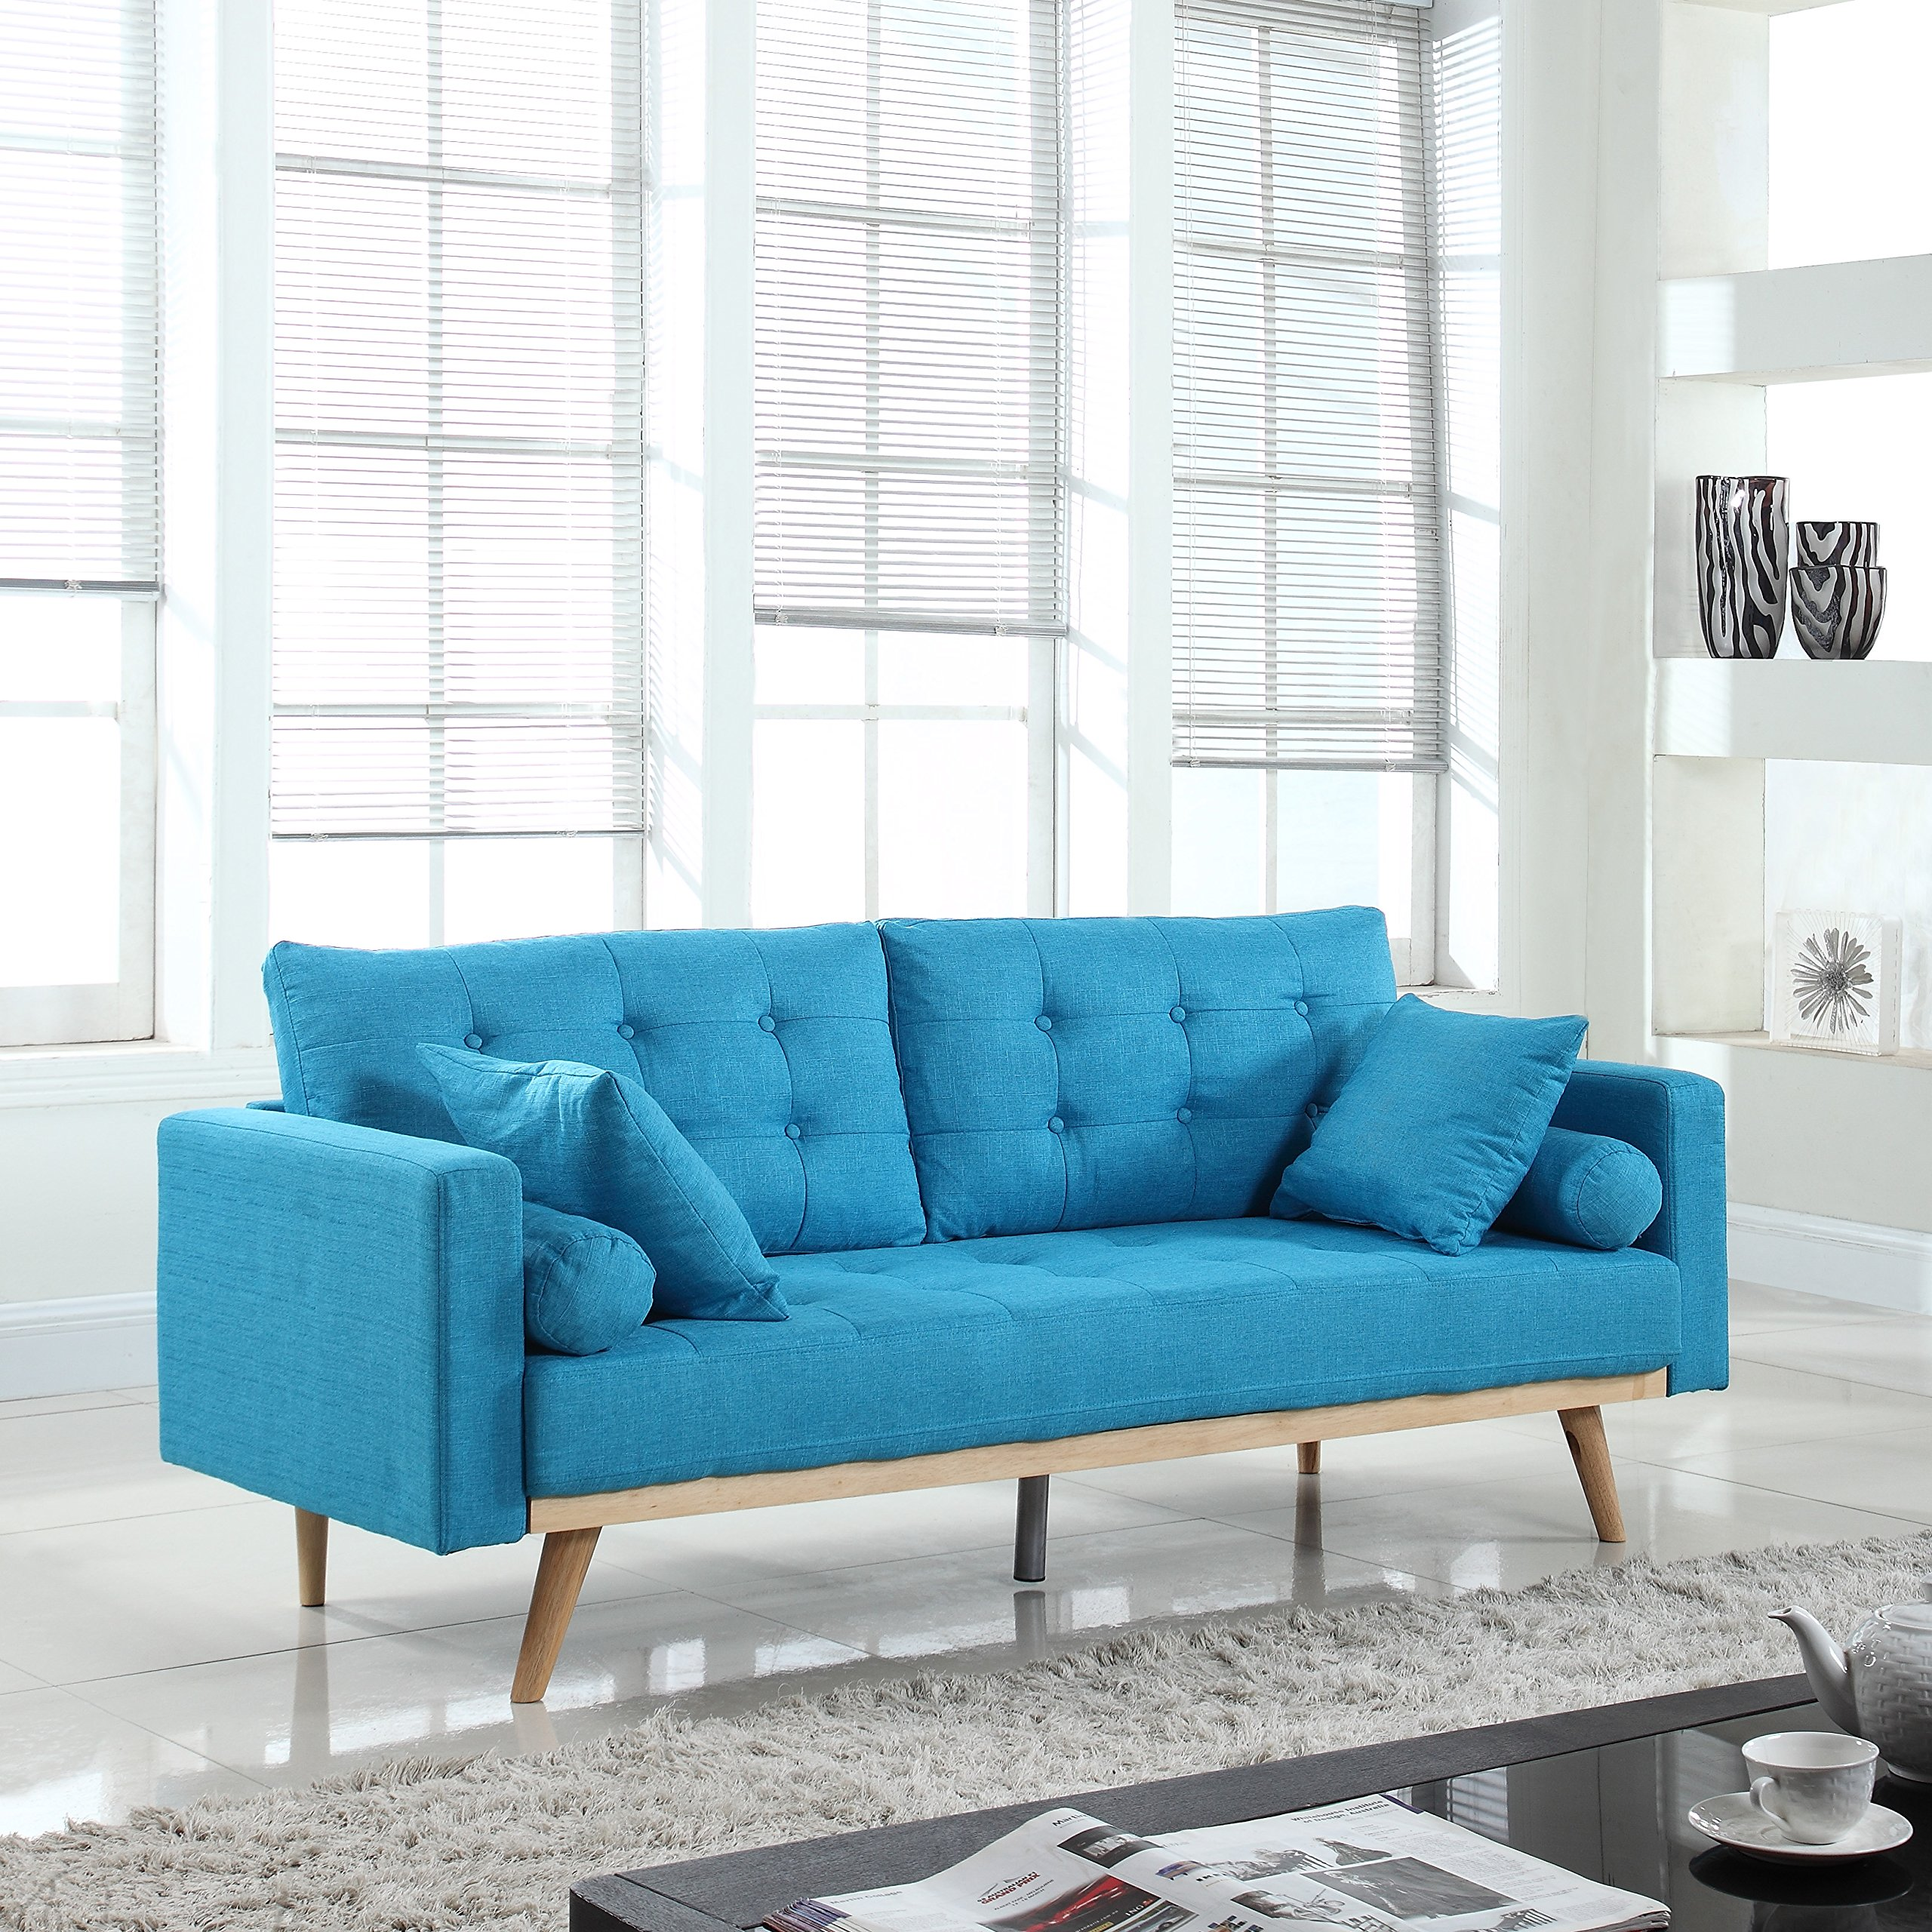 Madison Home Tufted Linen Mid-Century Modern Sofa Light Blue by Divano Roma Furniture